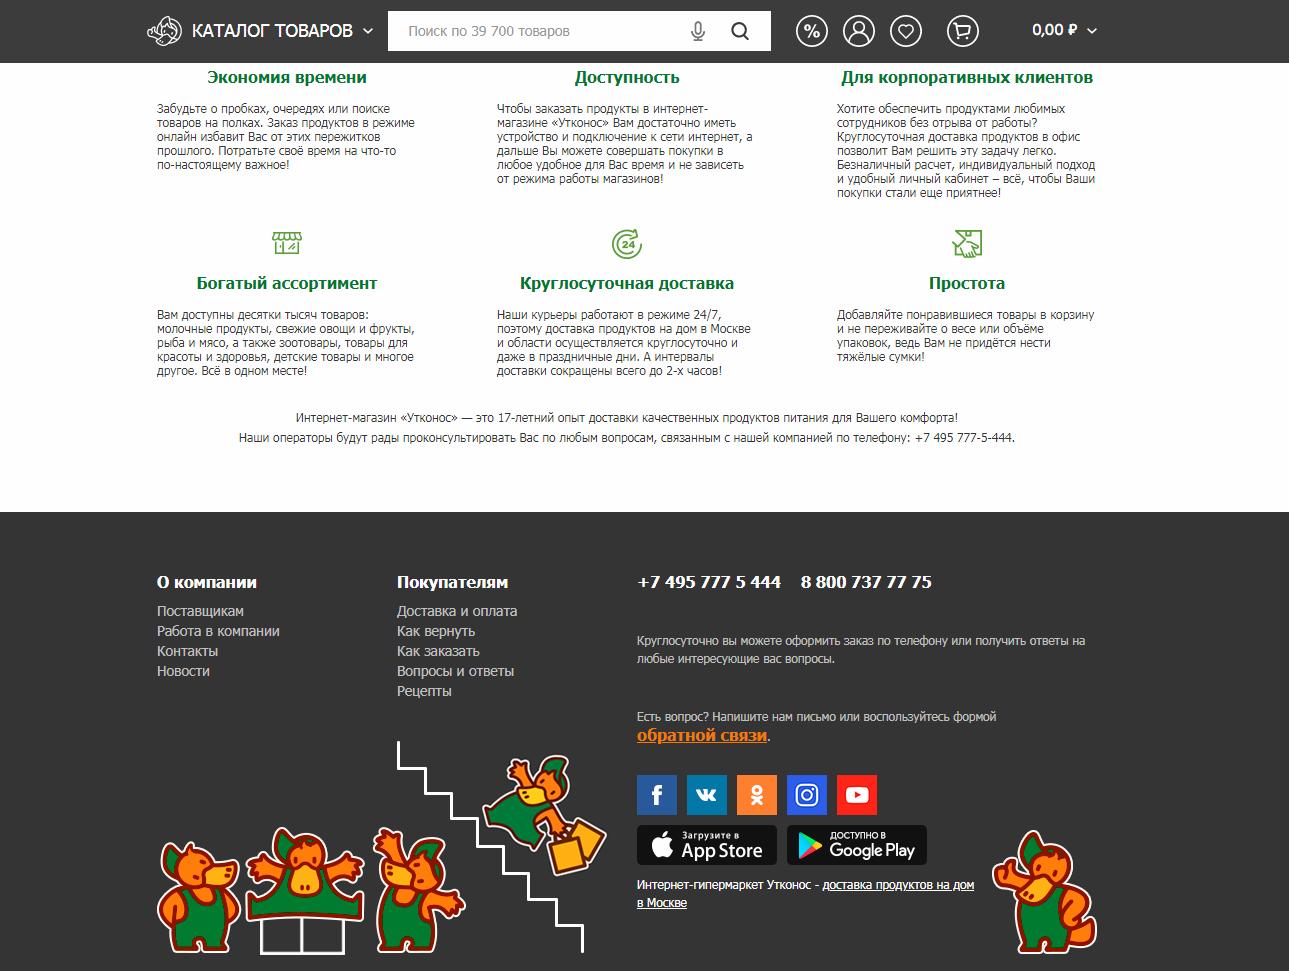 Кнопки для скачивания приложений на сайте «Утконоса»